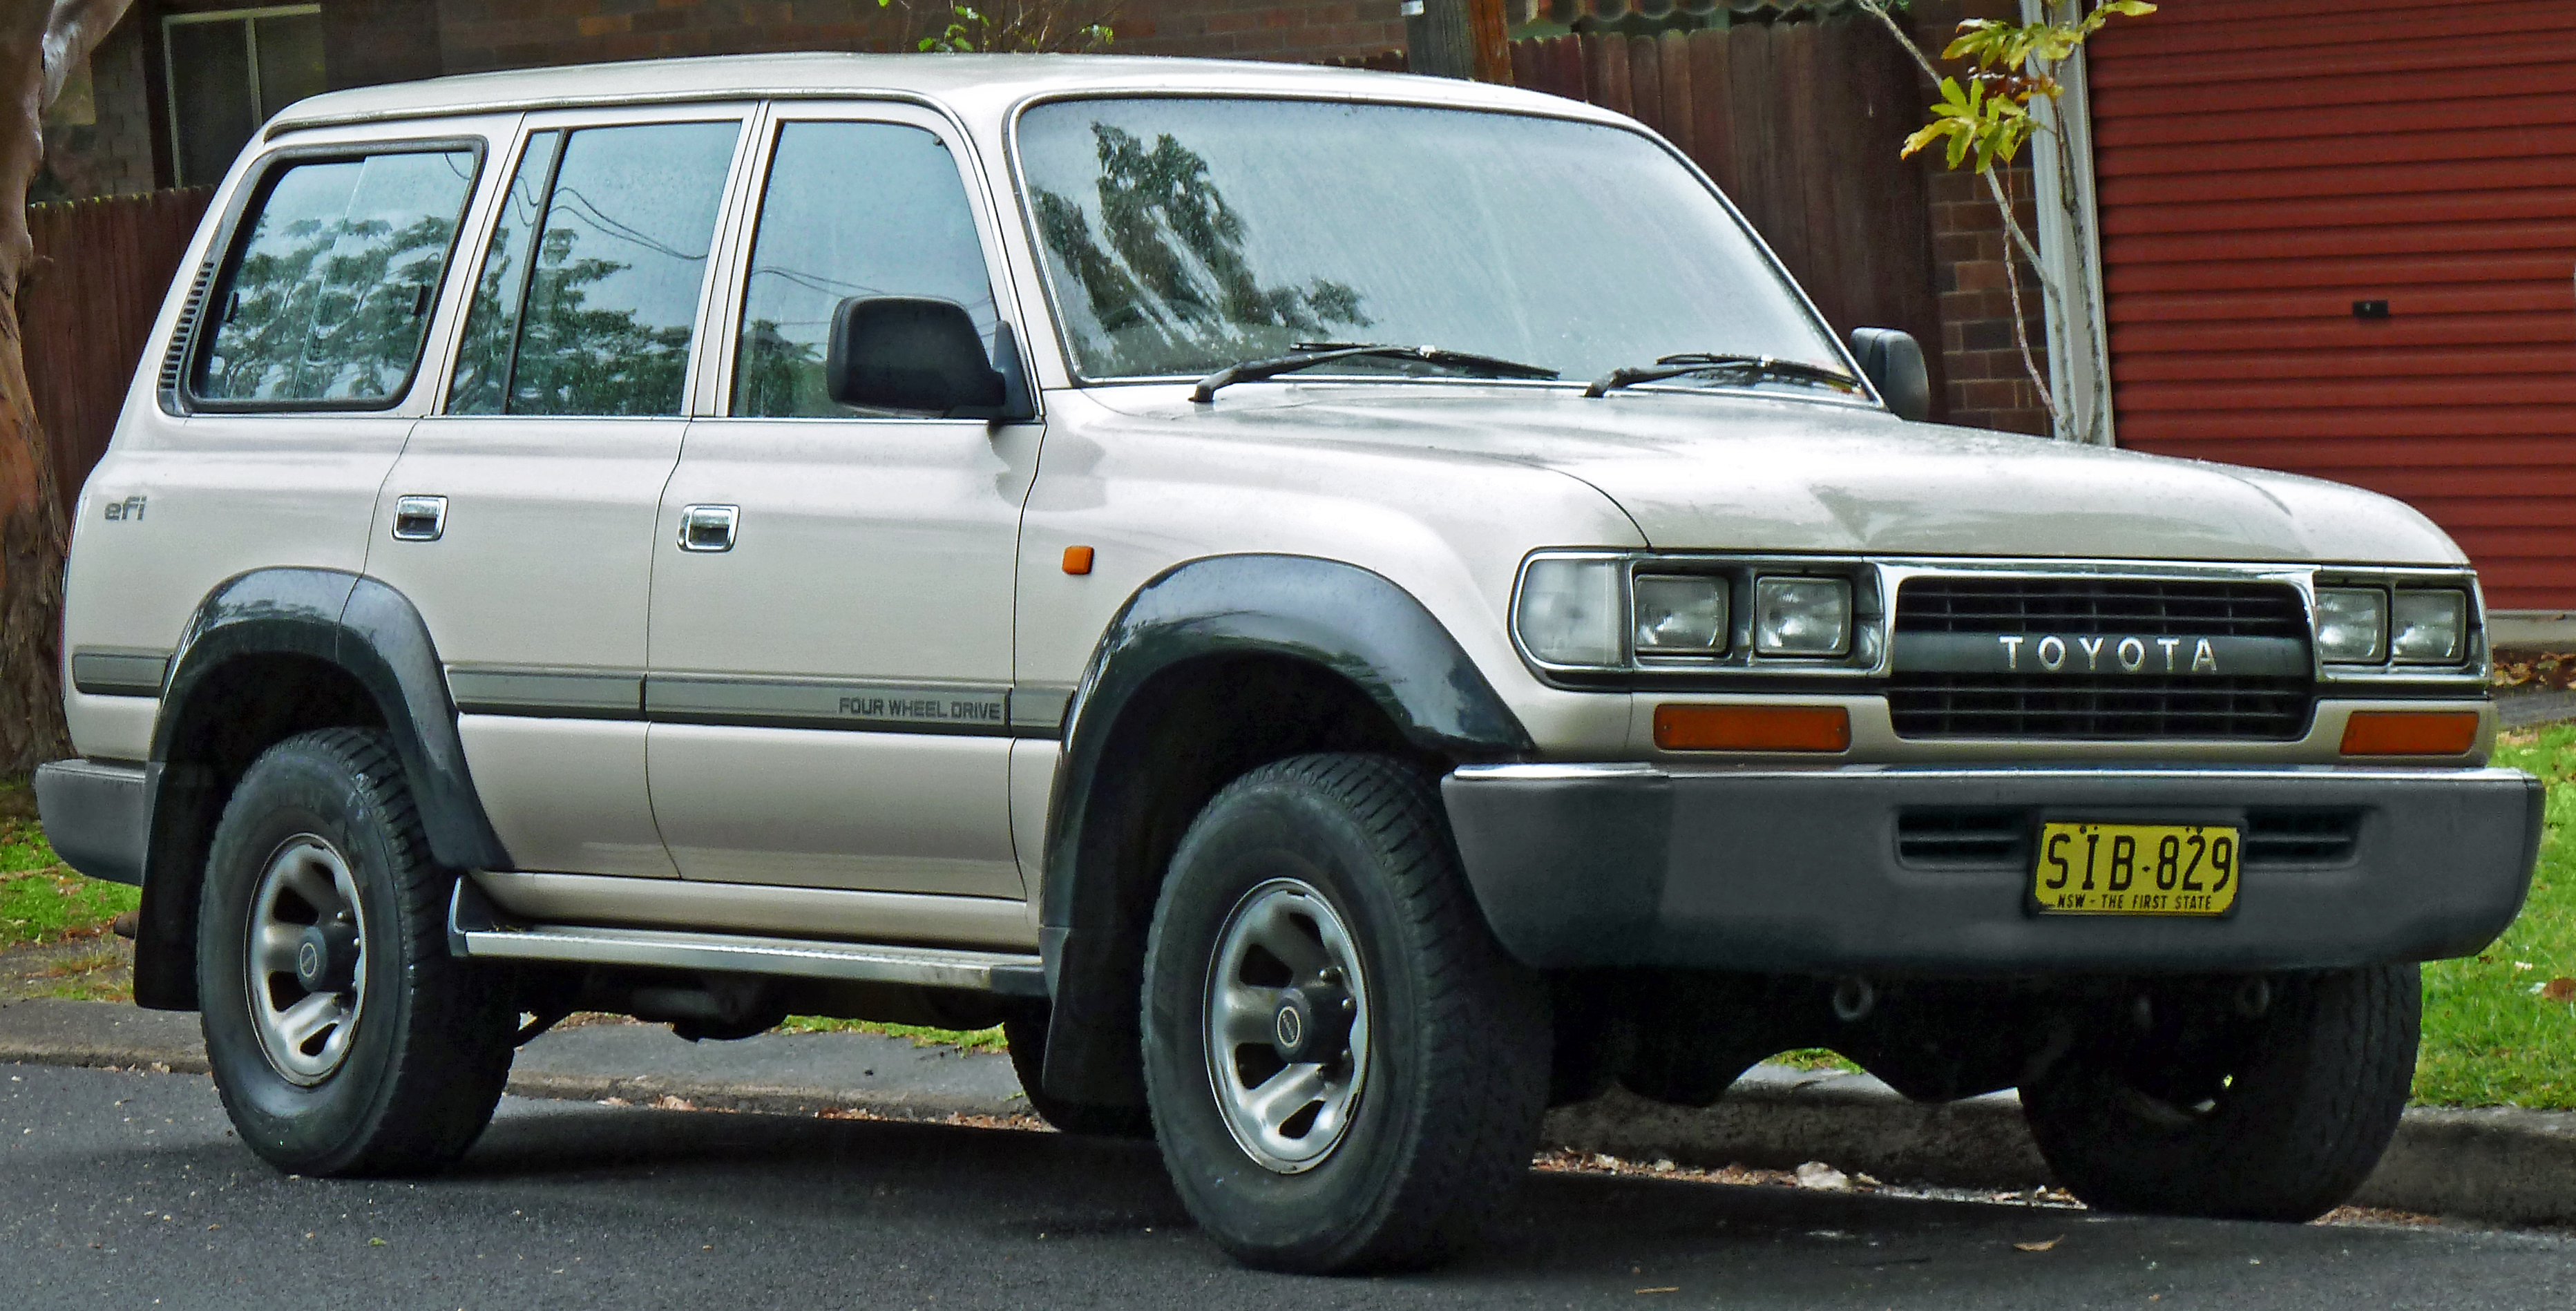 File 1990 1992 Toyota Land Cruiser Fj80r Gxl Wagon 2011 10 25 Jpg Wikimedia Commons